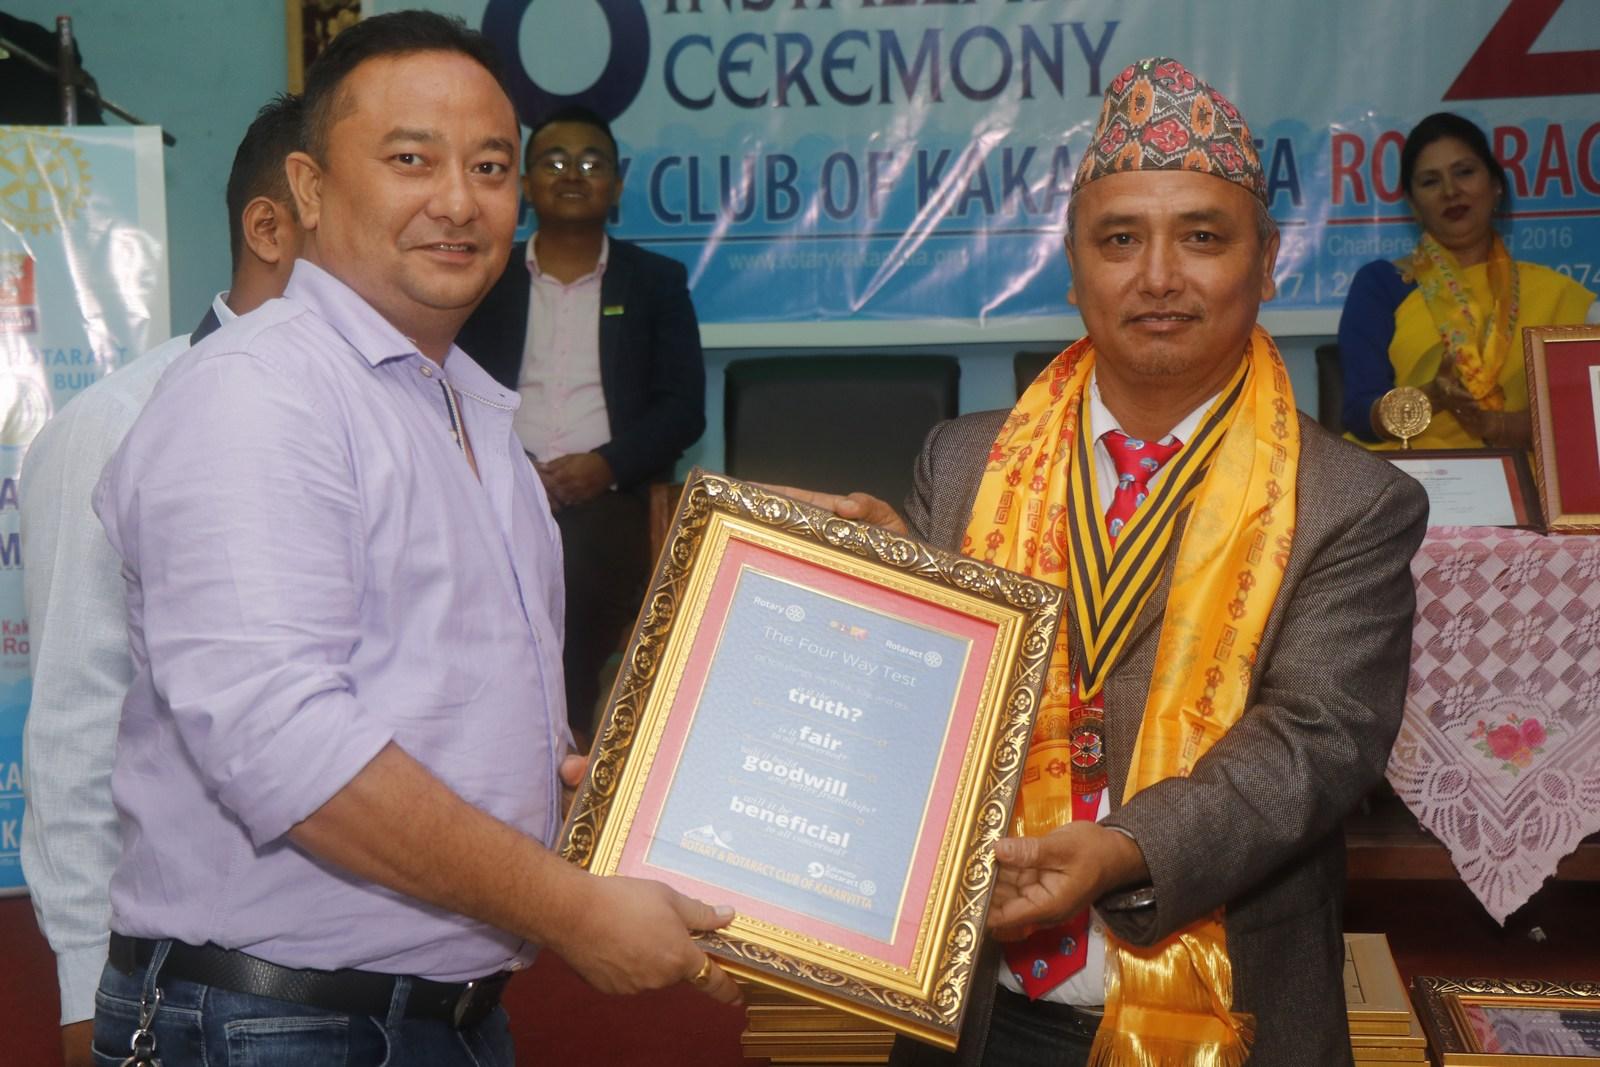 8th-Installation-Ceremony-Rotary-Club-of-Kakarvitta-105